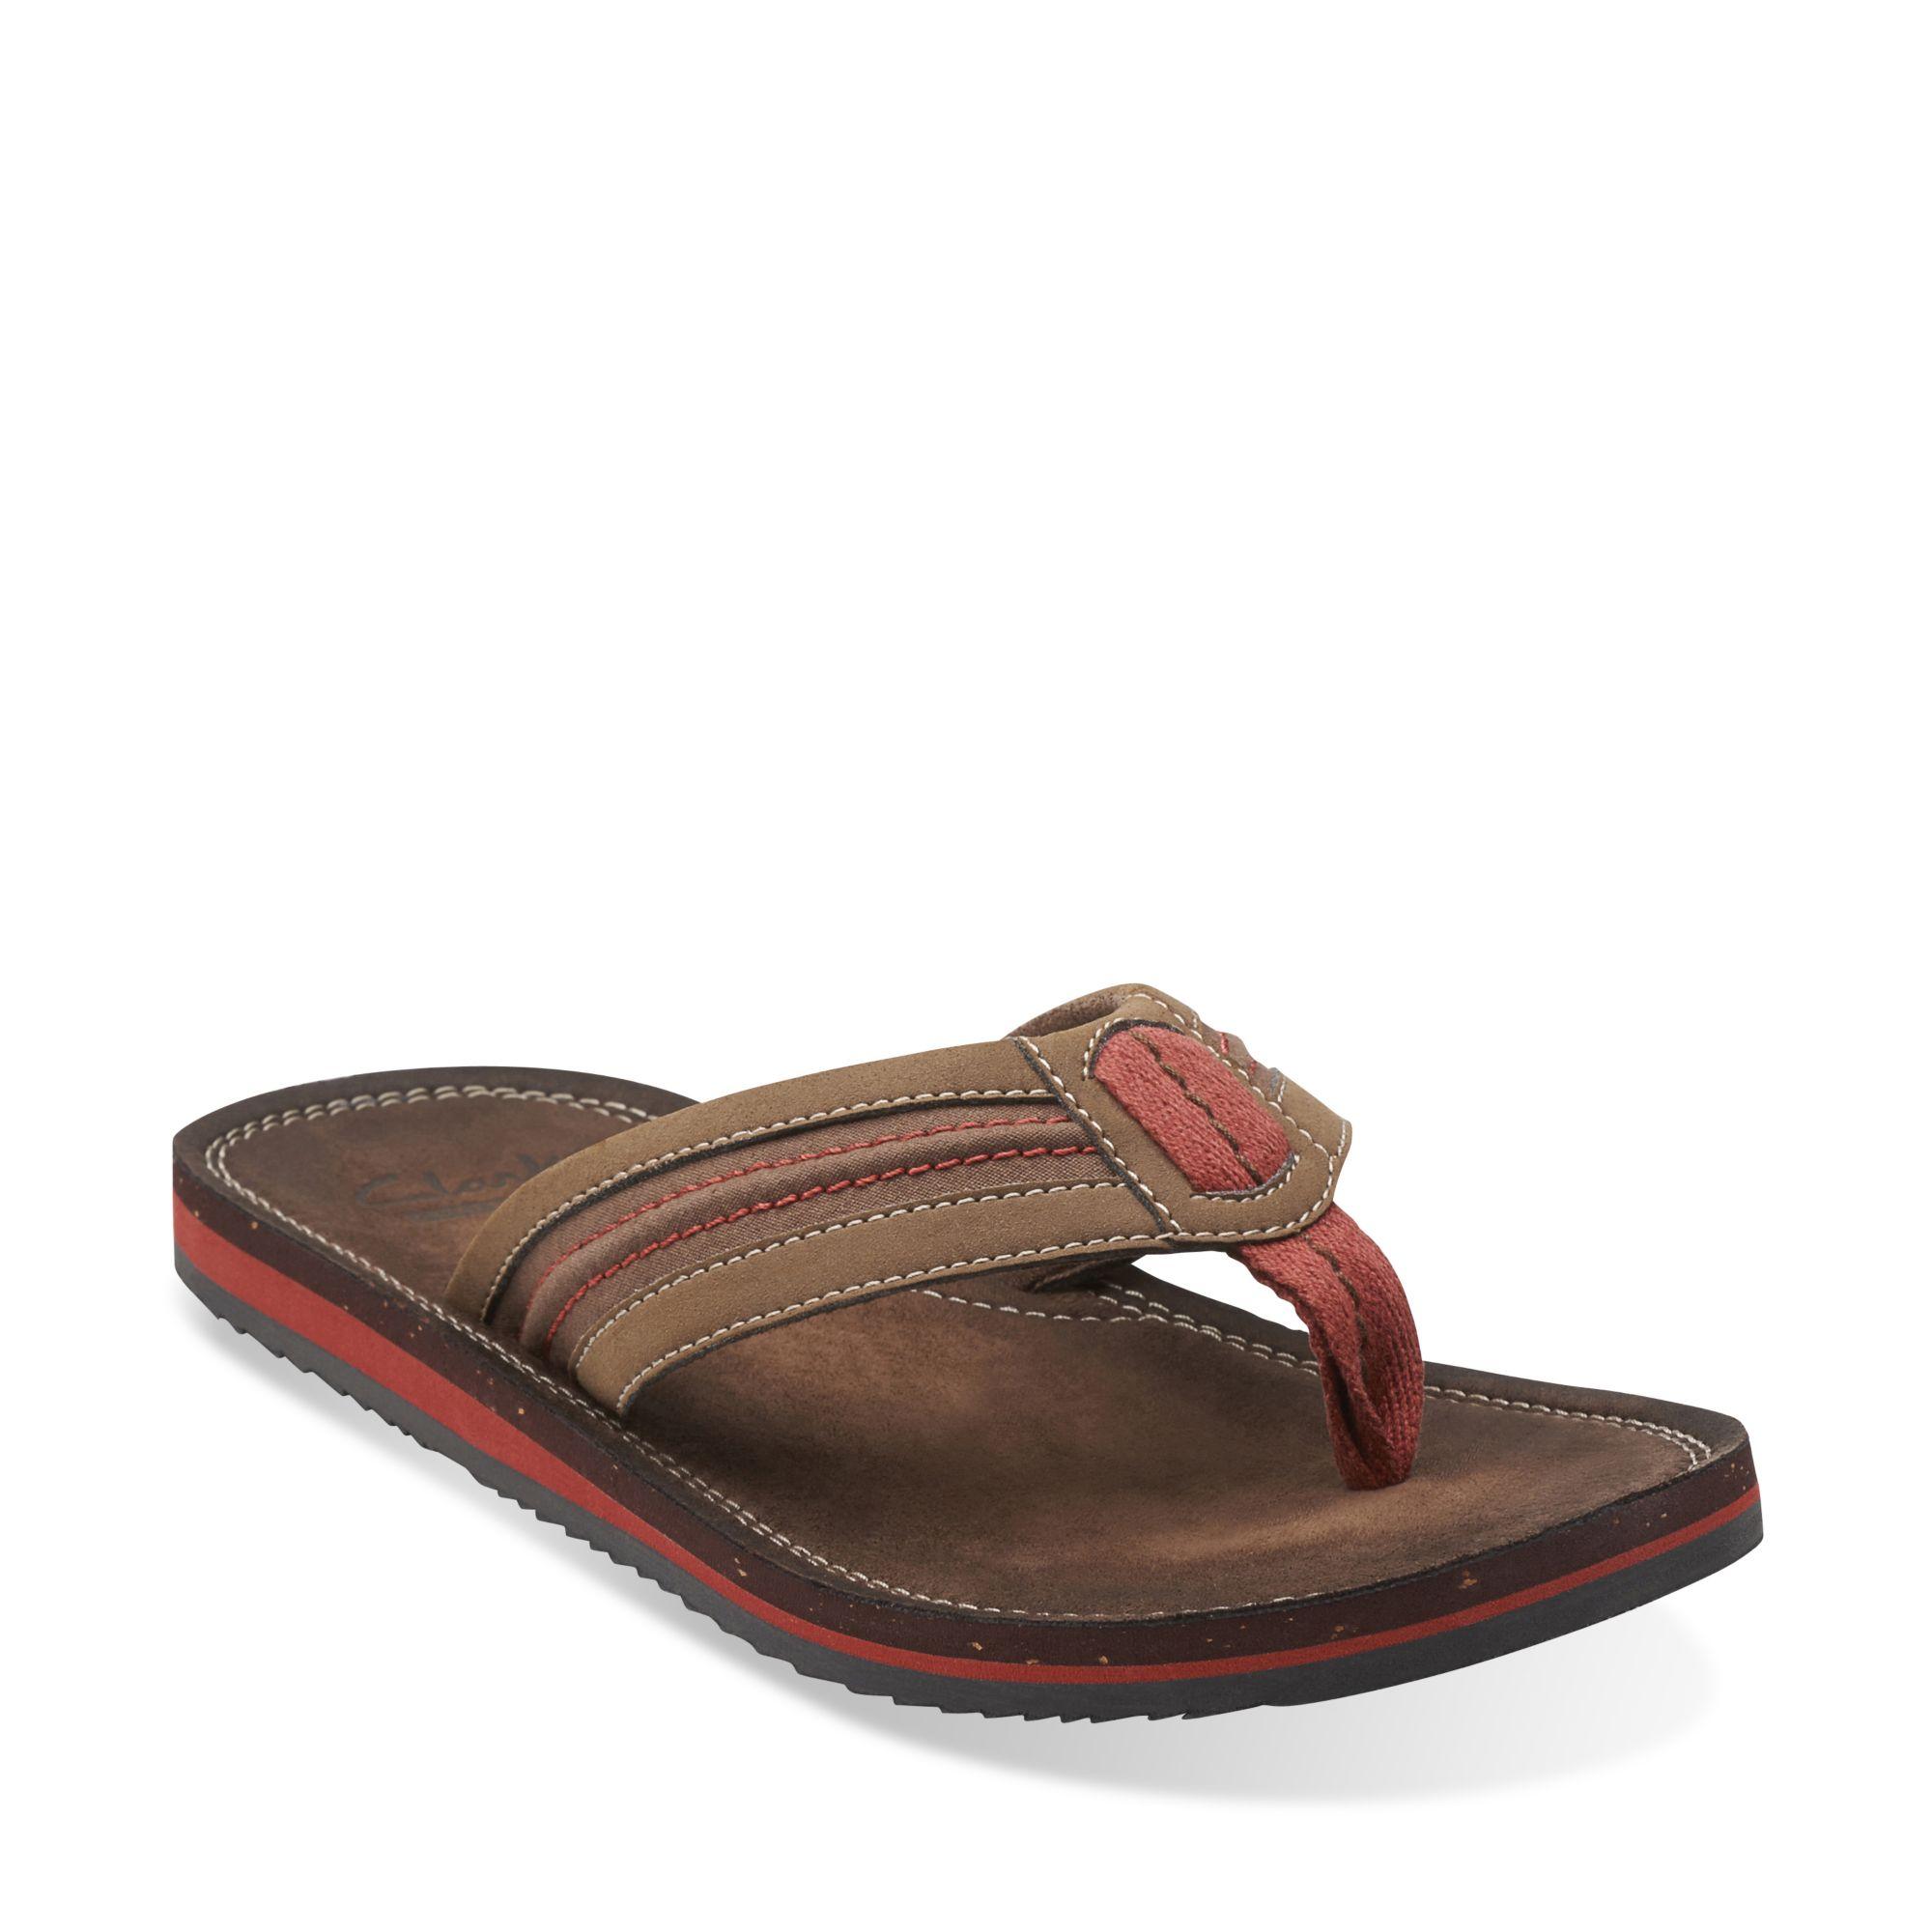 Сандали Clarks  2015 26105810 сандали cristhalia сандали